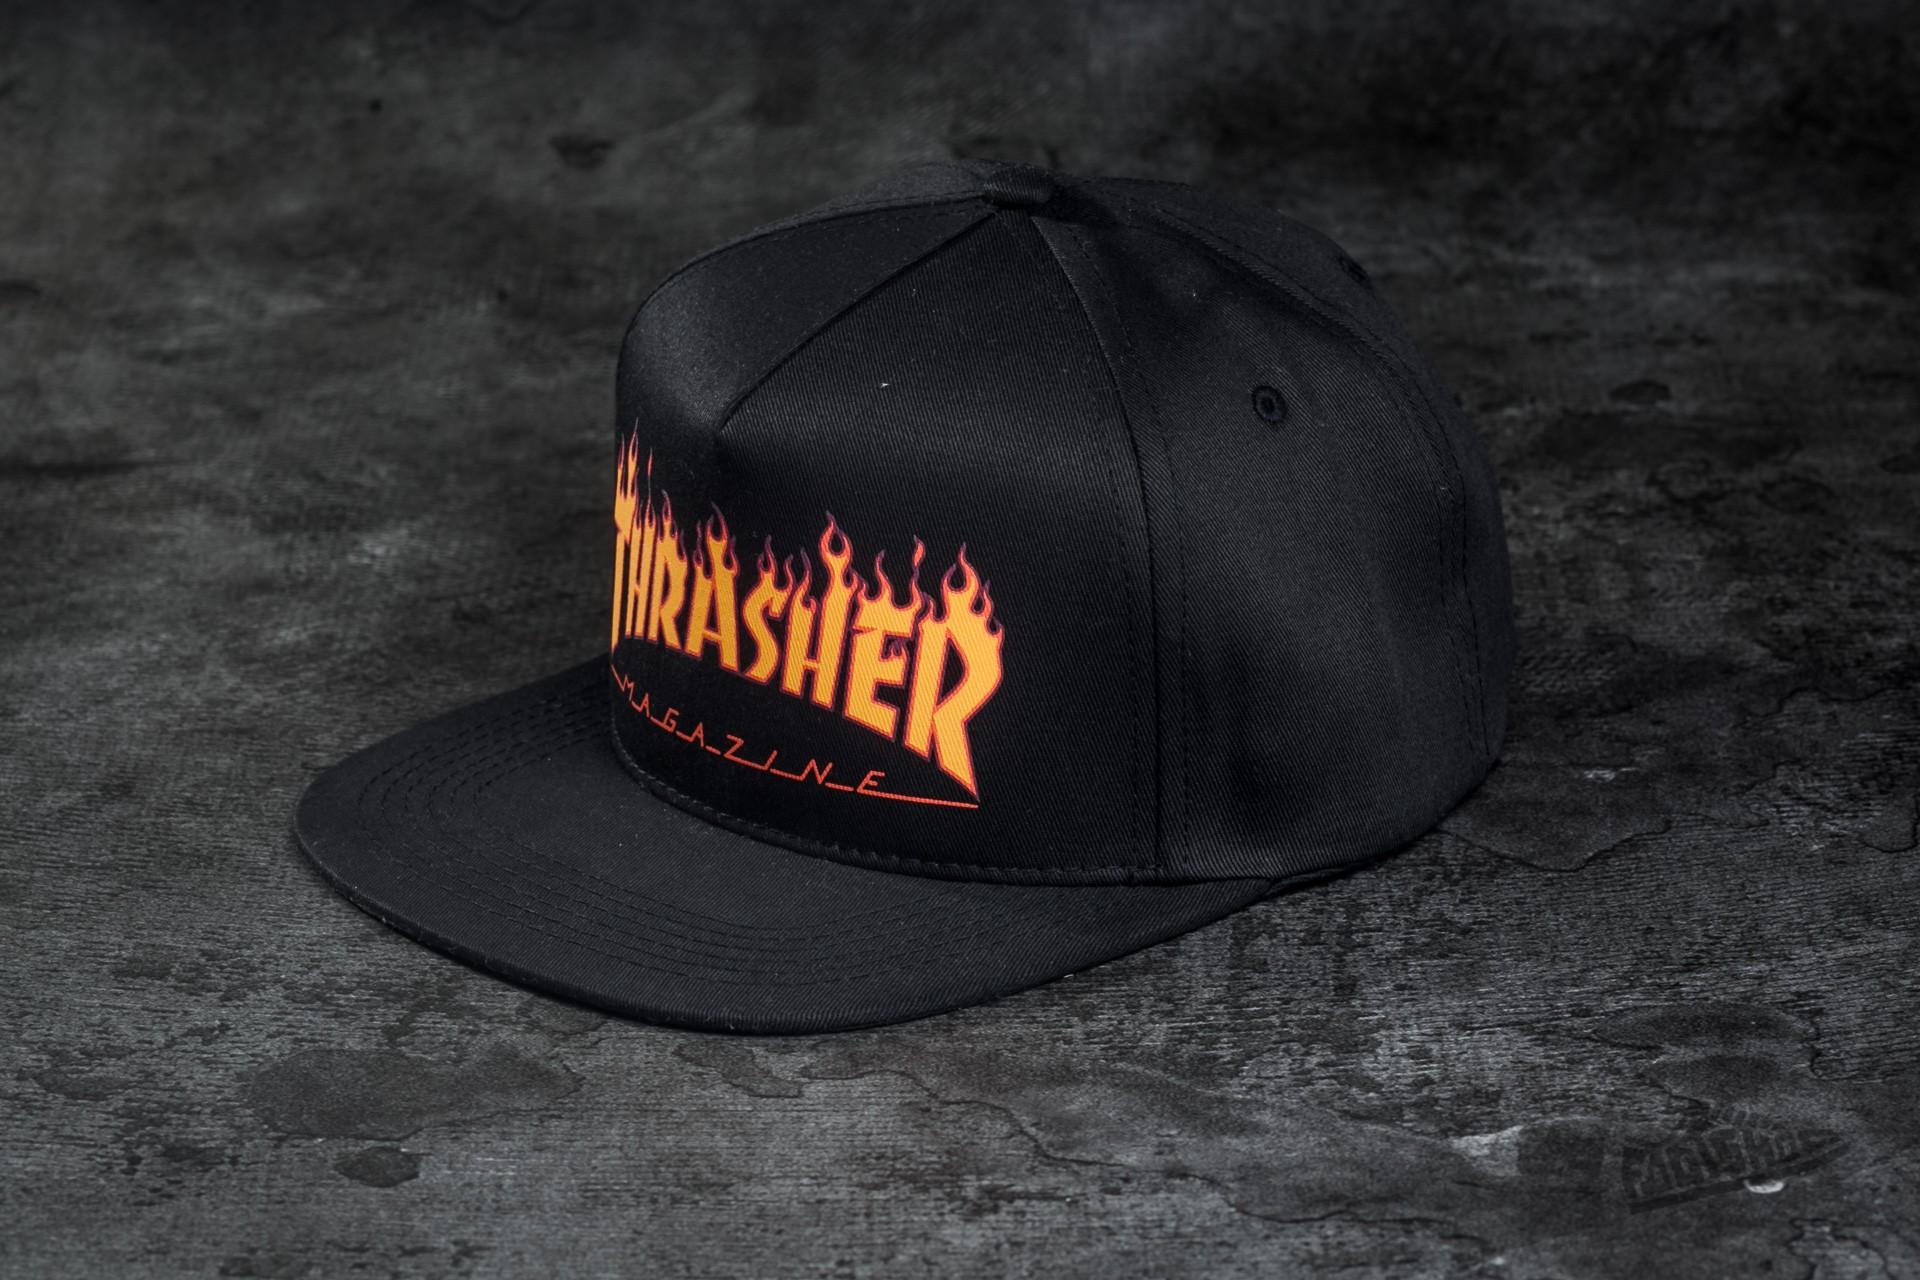 3ac7db62735 Thrasher Flame Logo Structured Snapback Black